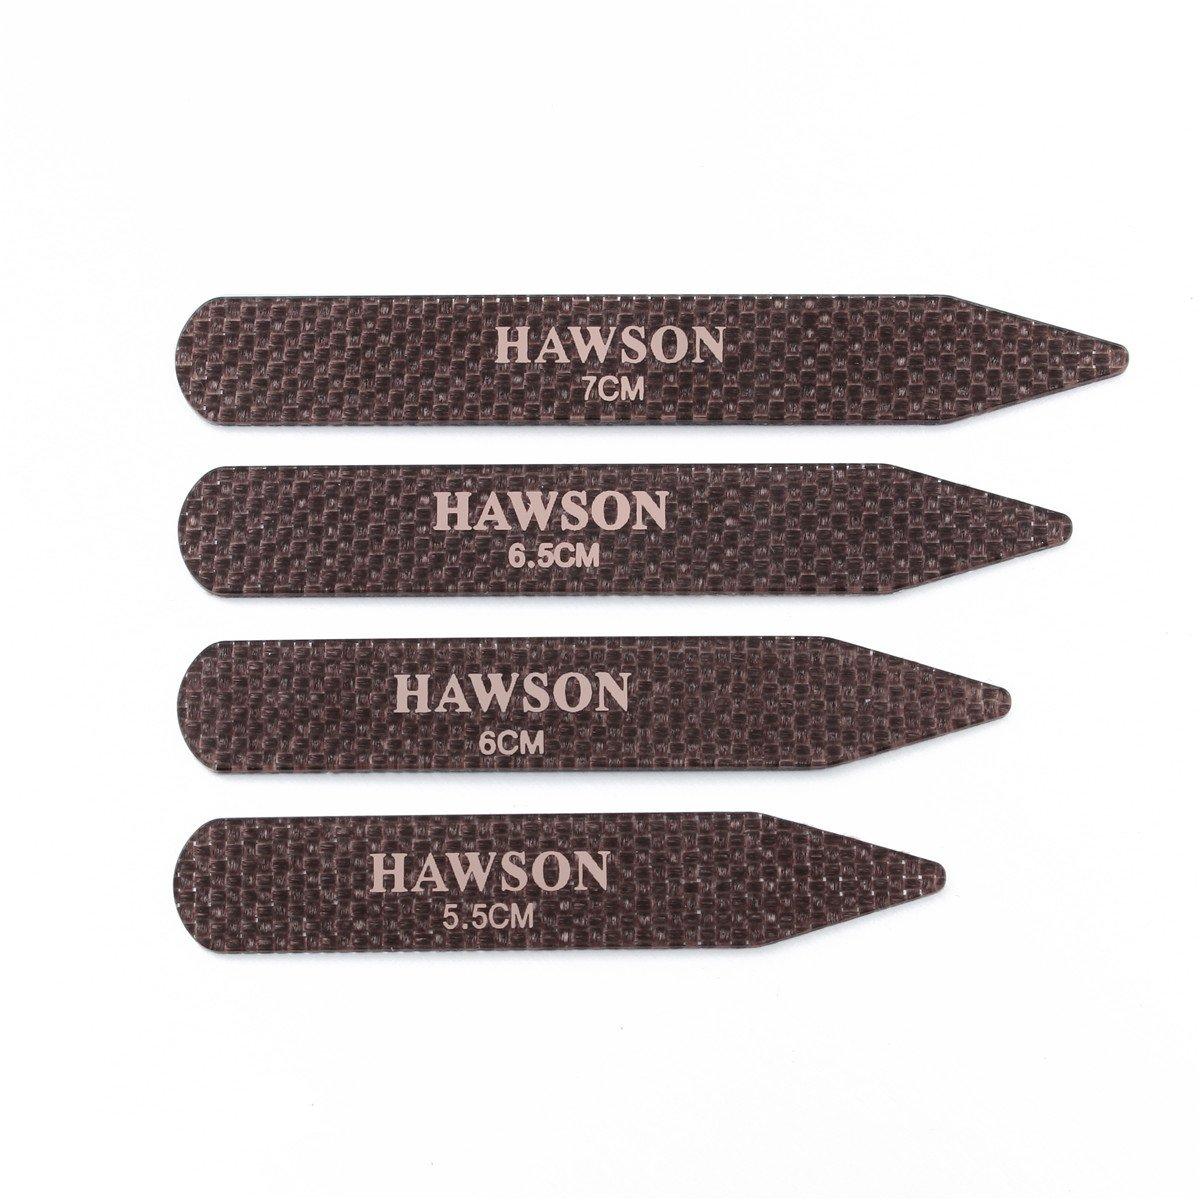 HAWSON Carbon Fiber Collar Stays Clips For Man Shirt accessories 4 Sizes 201565